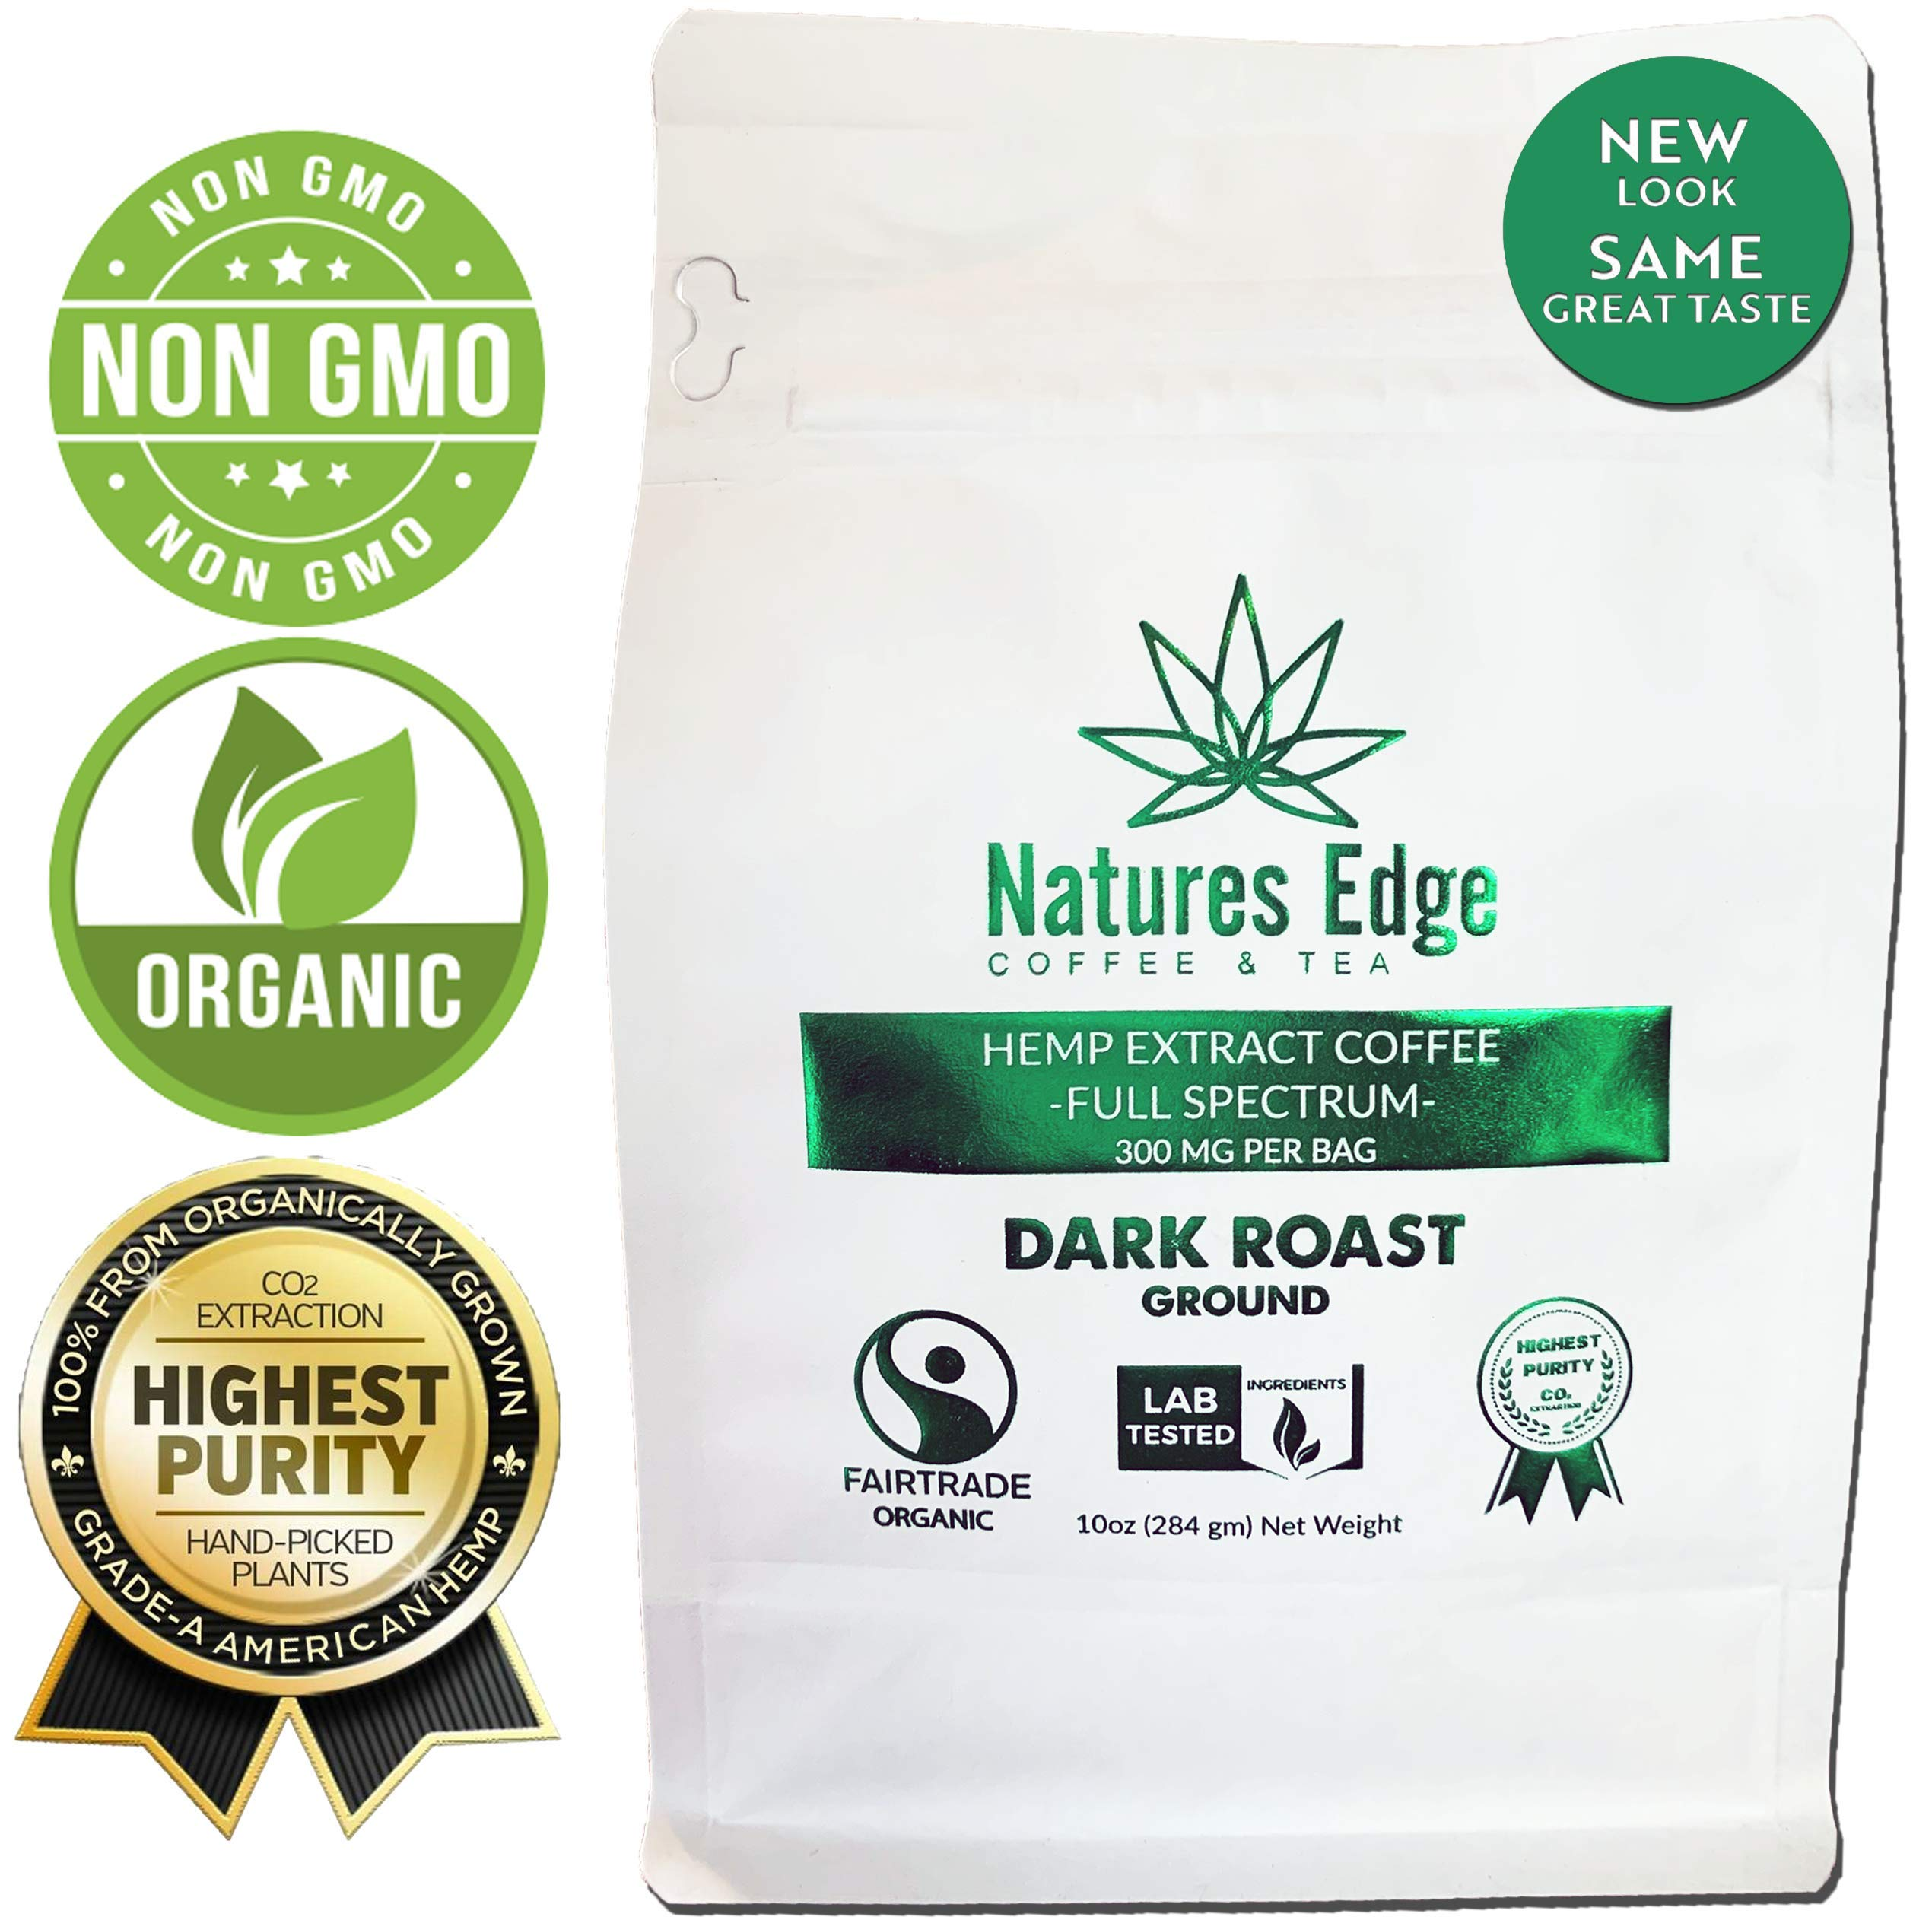 Natures Edge Organic Hemp Coffee, Dark Roast - Ground 10 oz Bag (300 MG)